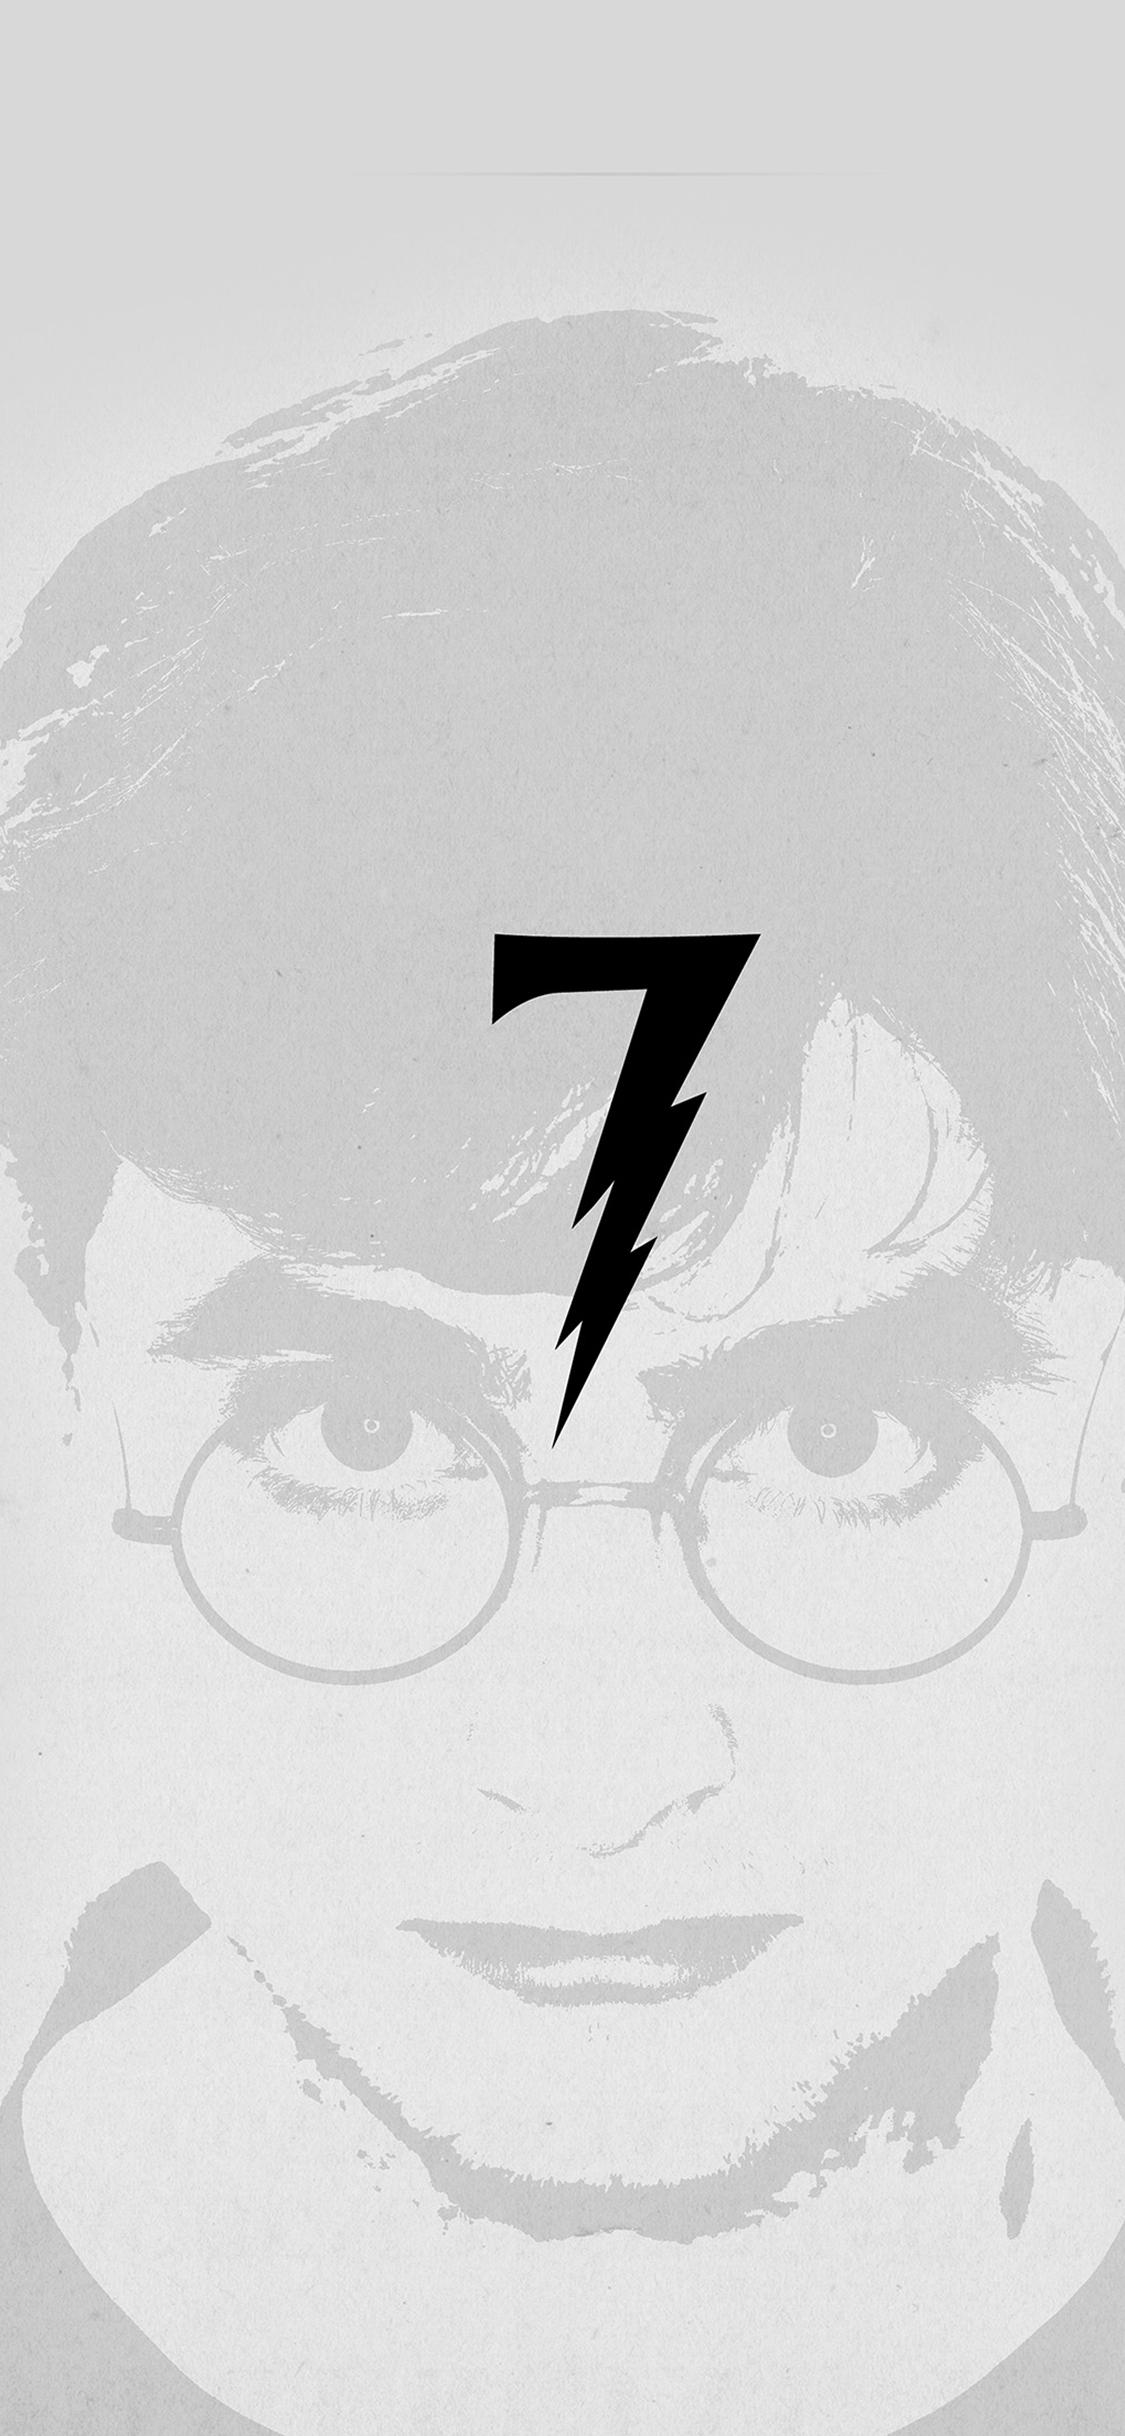 Harry Potter Art Minimal Film Gray Iphone X Wallpapers Free